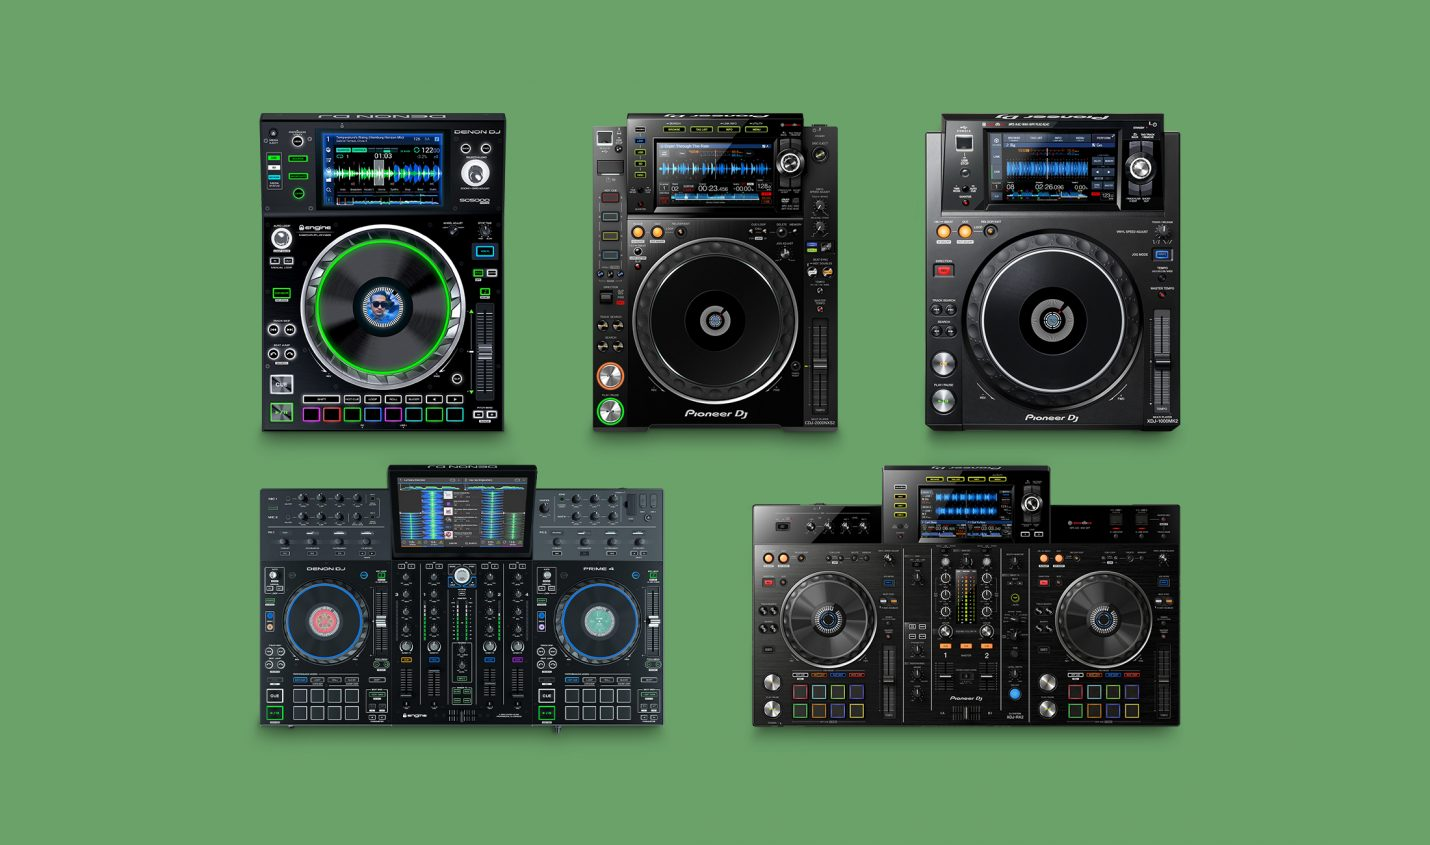 Überblick: Die besten DJ-Mediaplayer